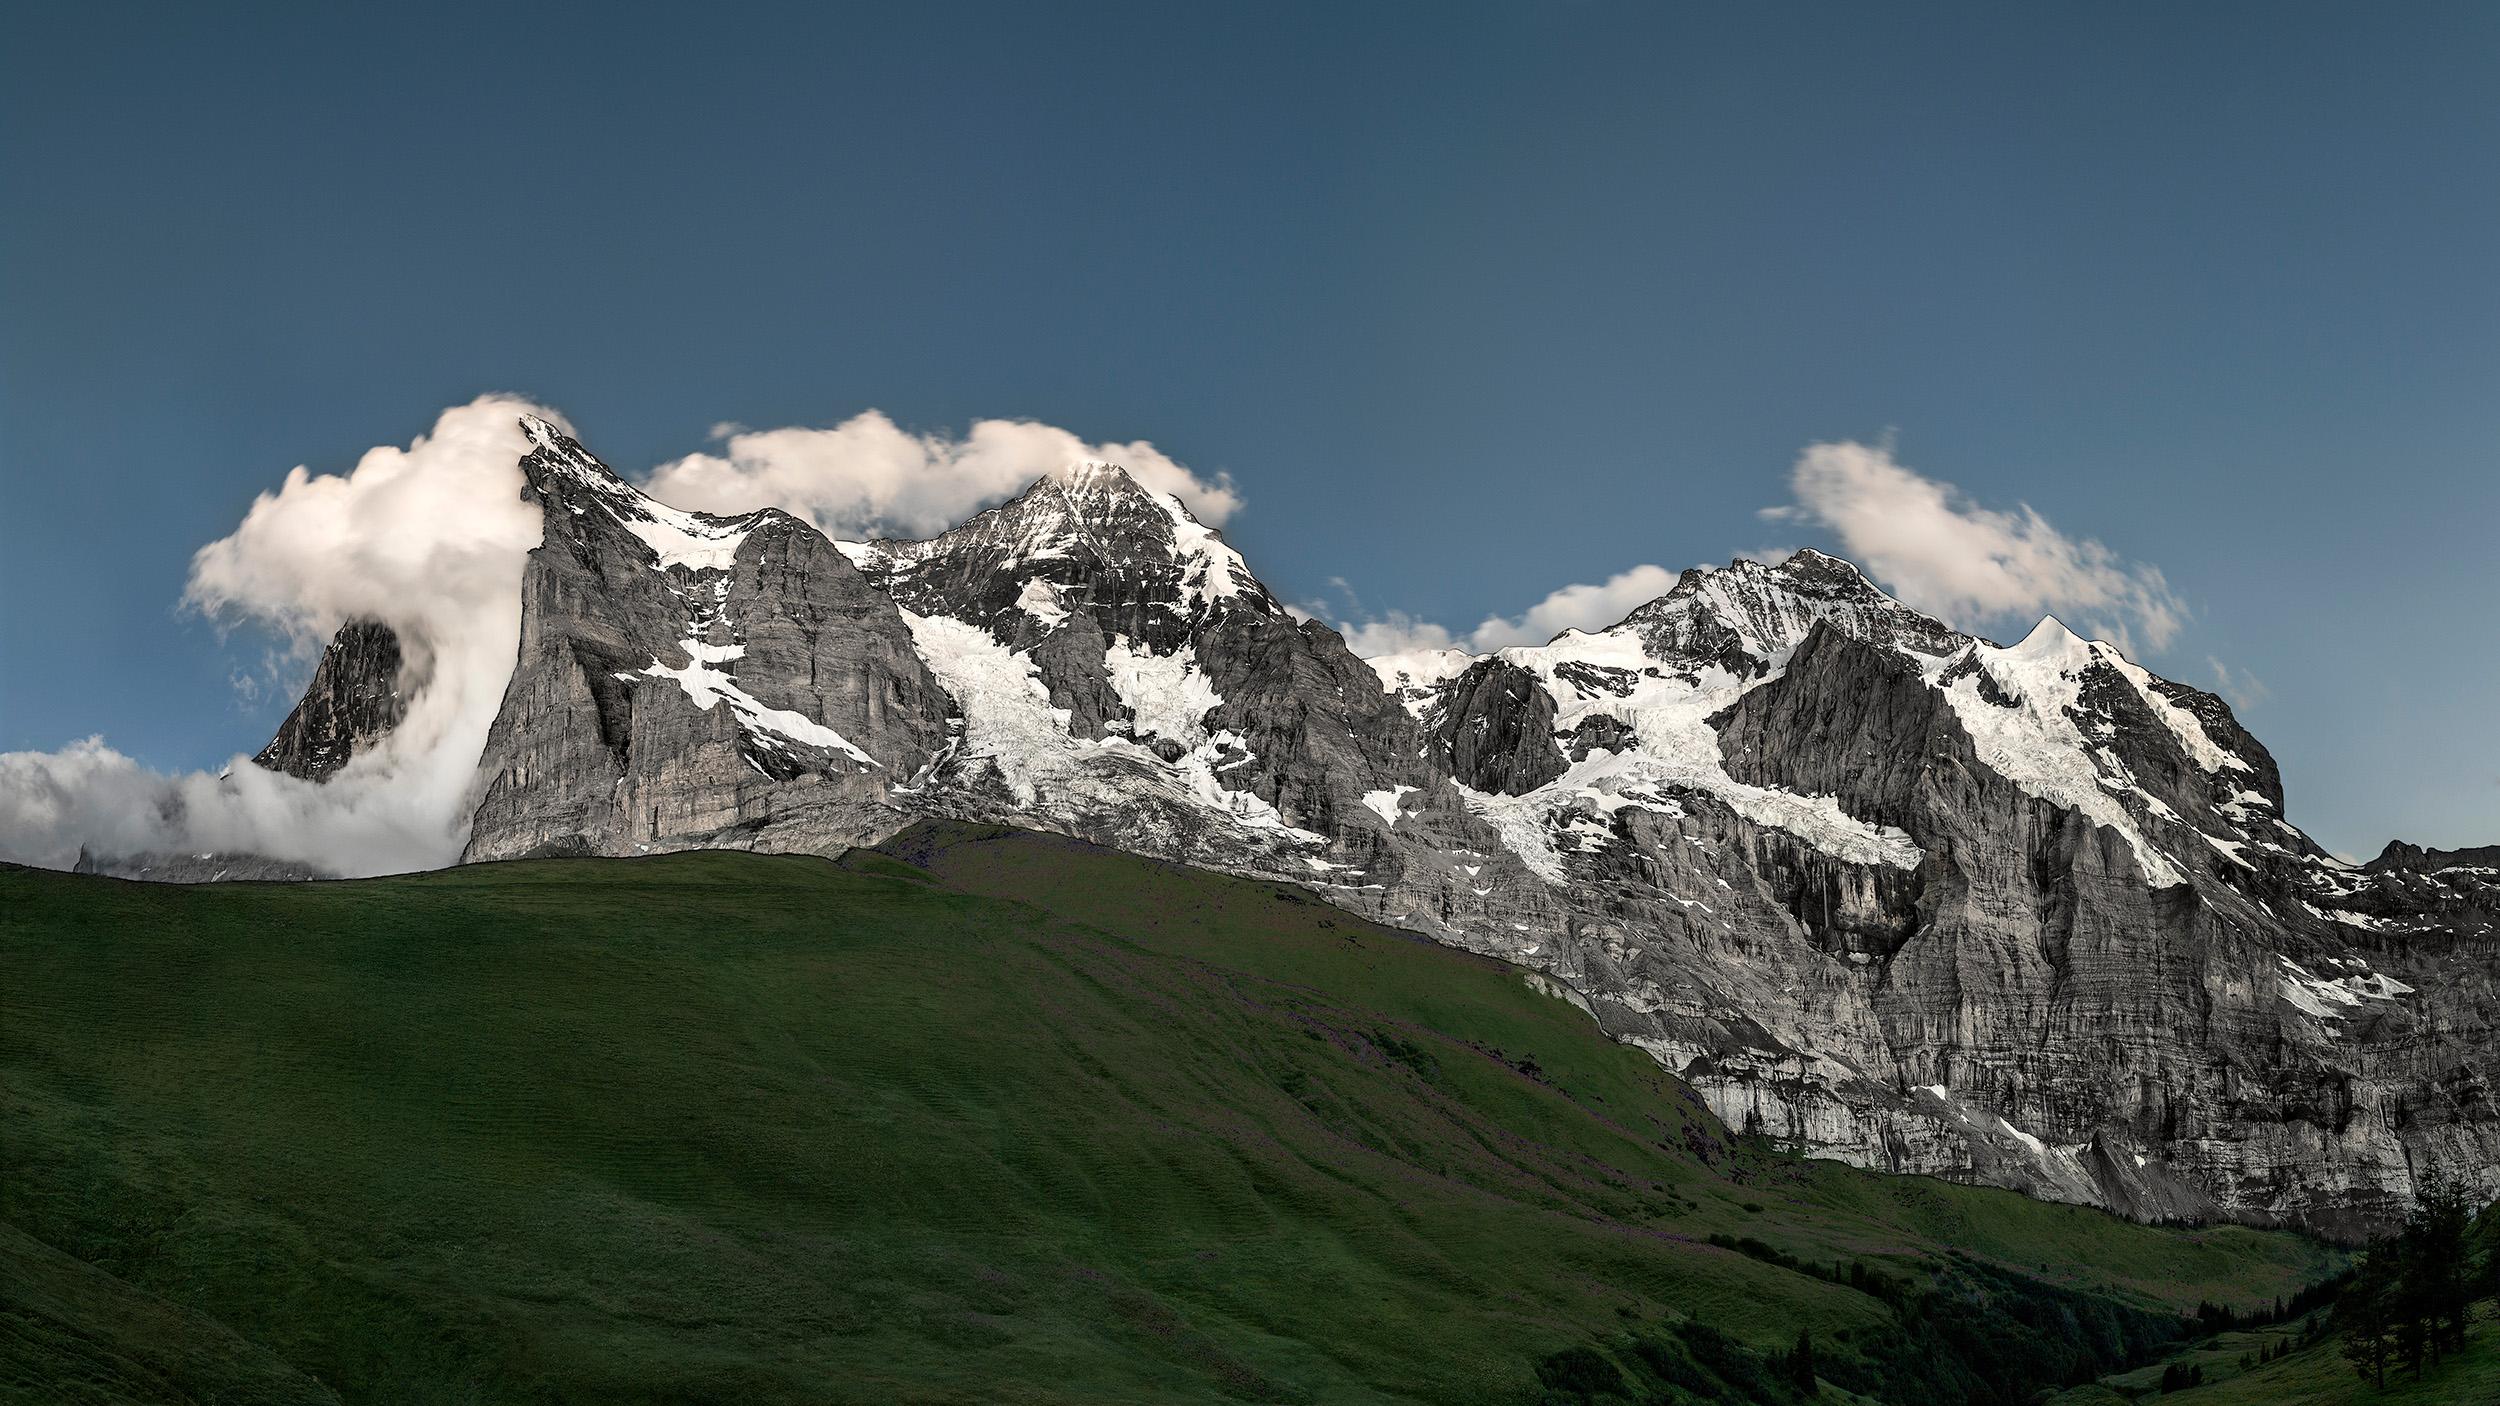 Landschaftsfotografie | Eiger, Mönch and Jungfrau I